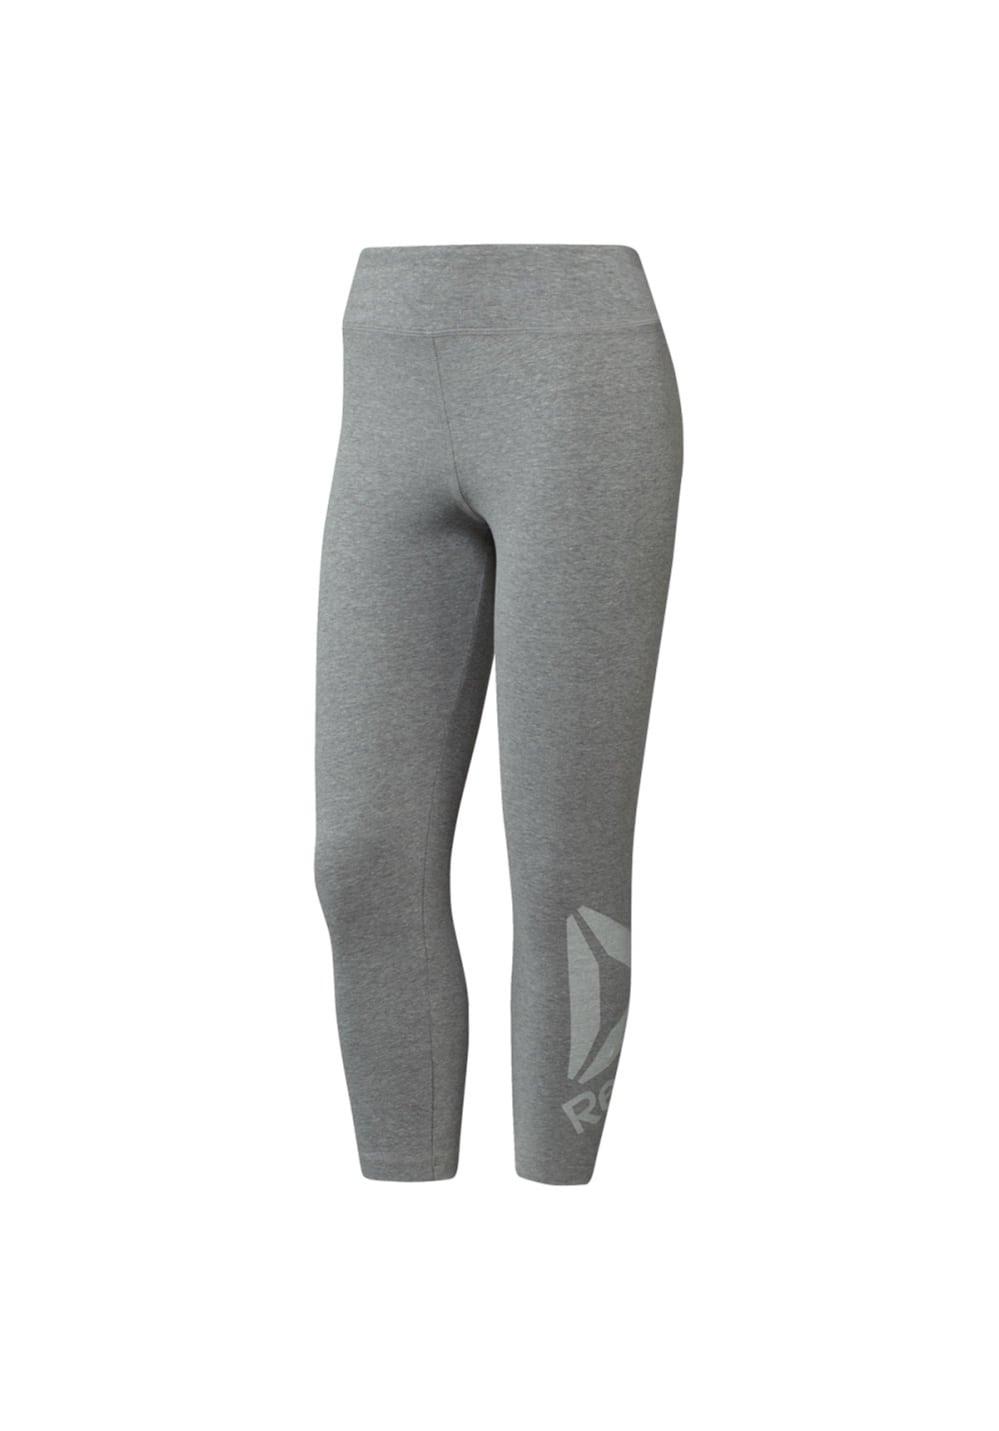 Reebok Elements Snow Melange Leggings - Laufhosen für Damen - Grau, Gr. XS